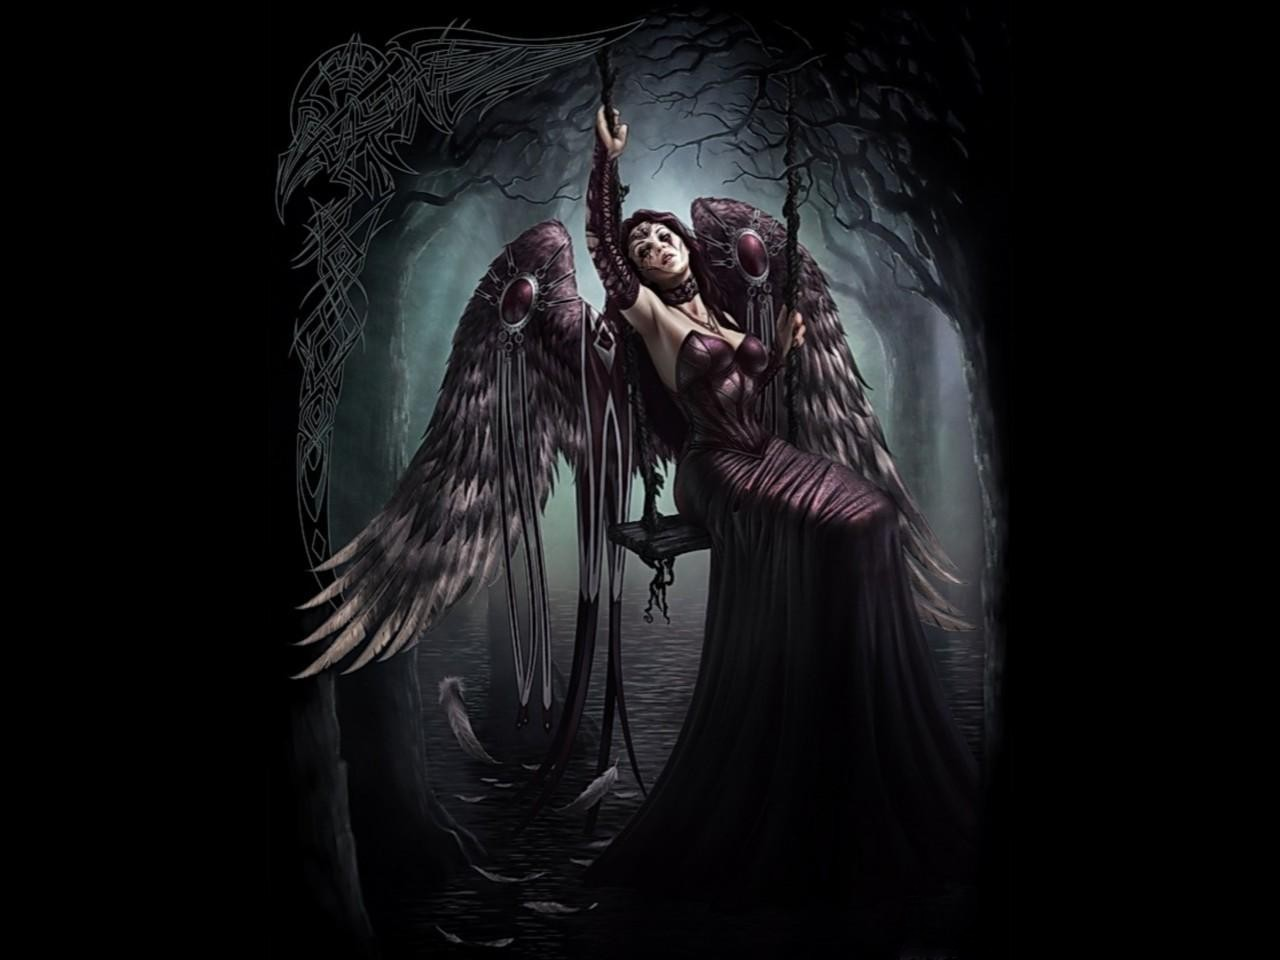 Dark Angel Wallpaper 1280x960 Dark Angel 1280x960